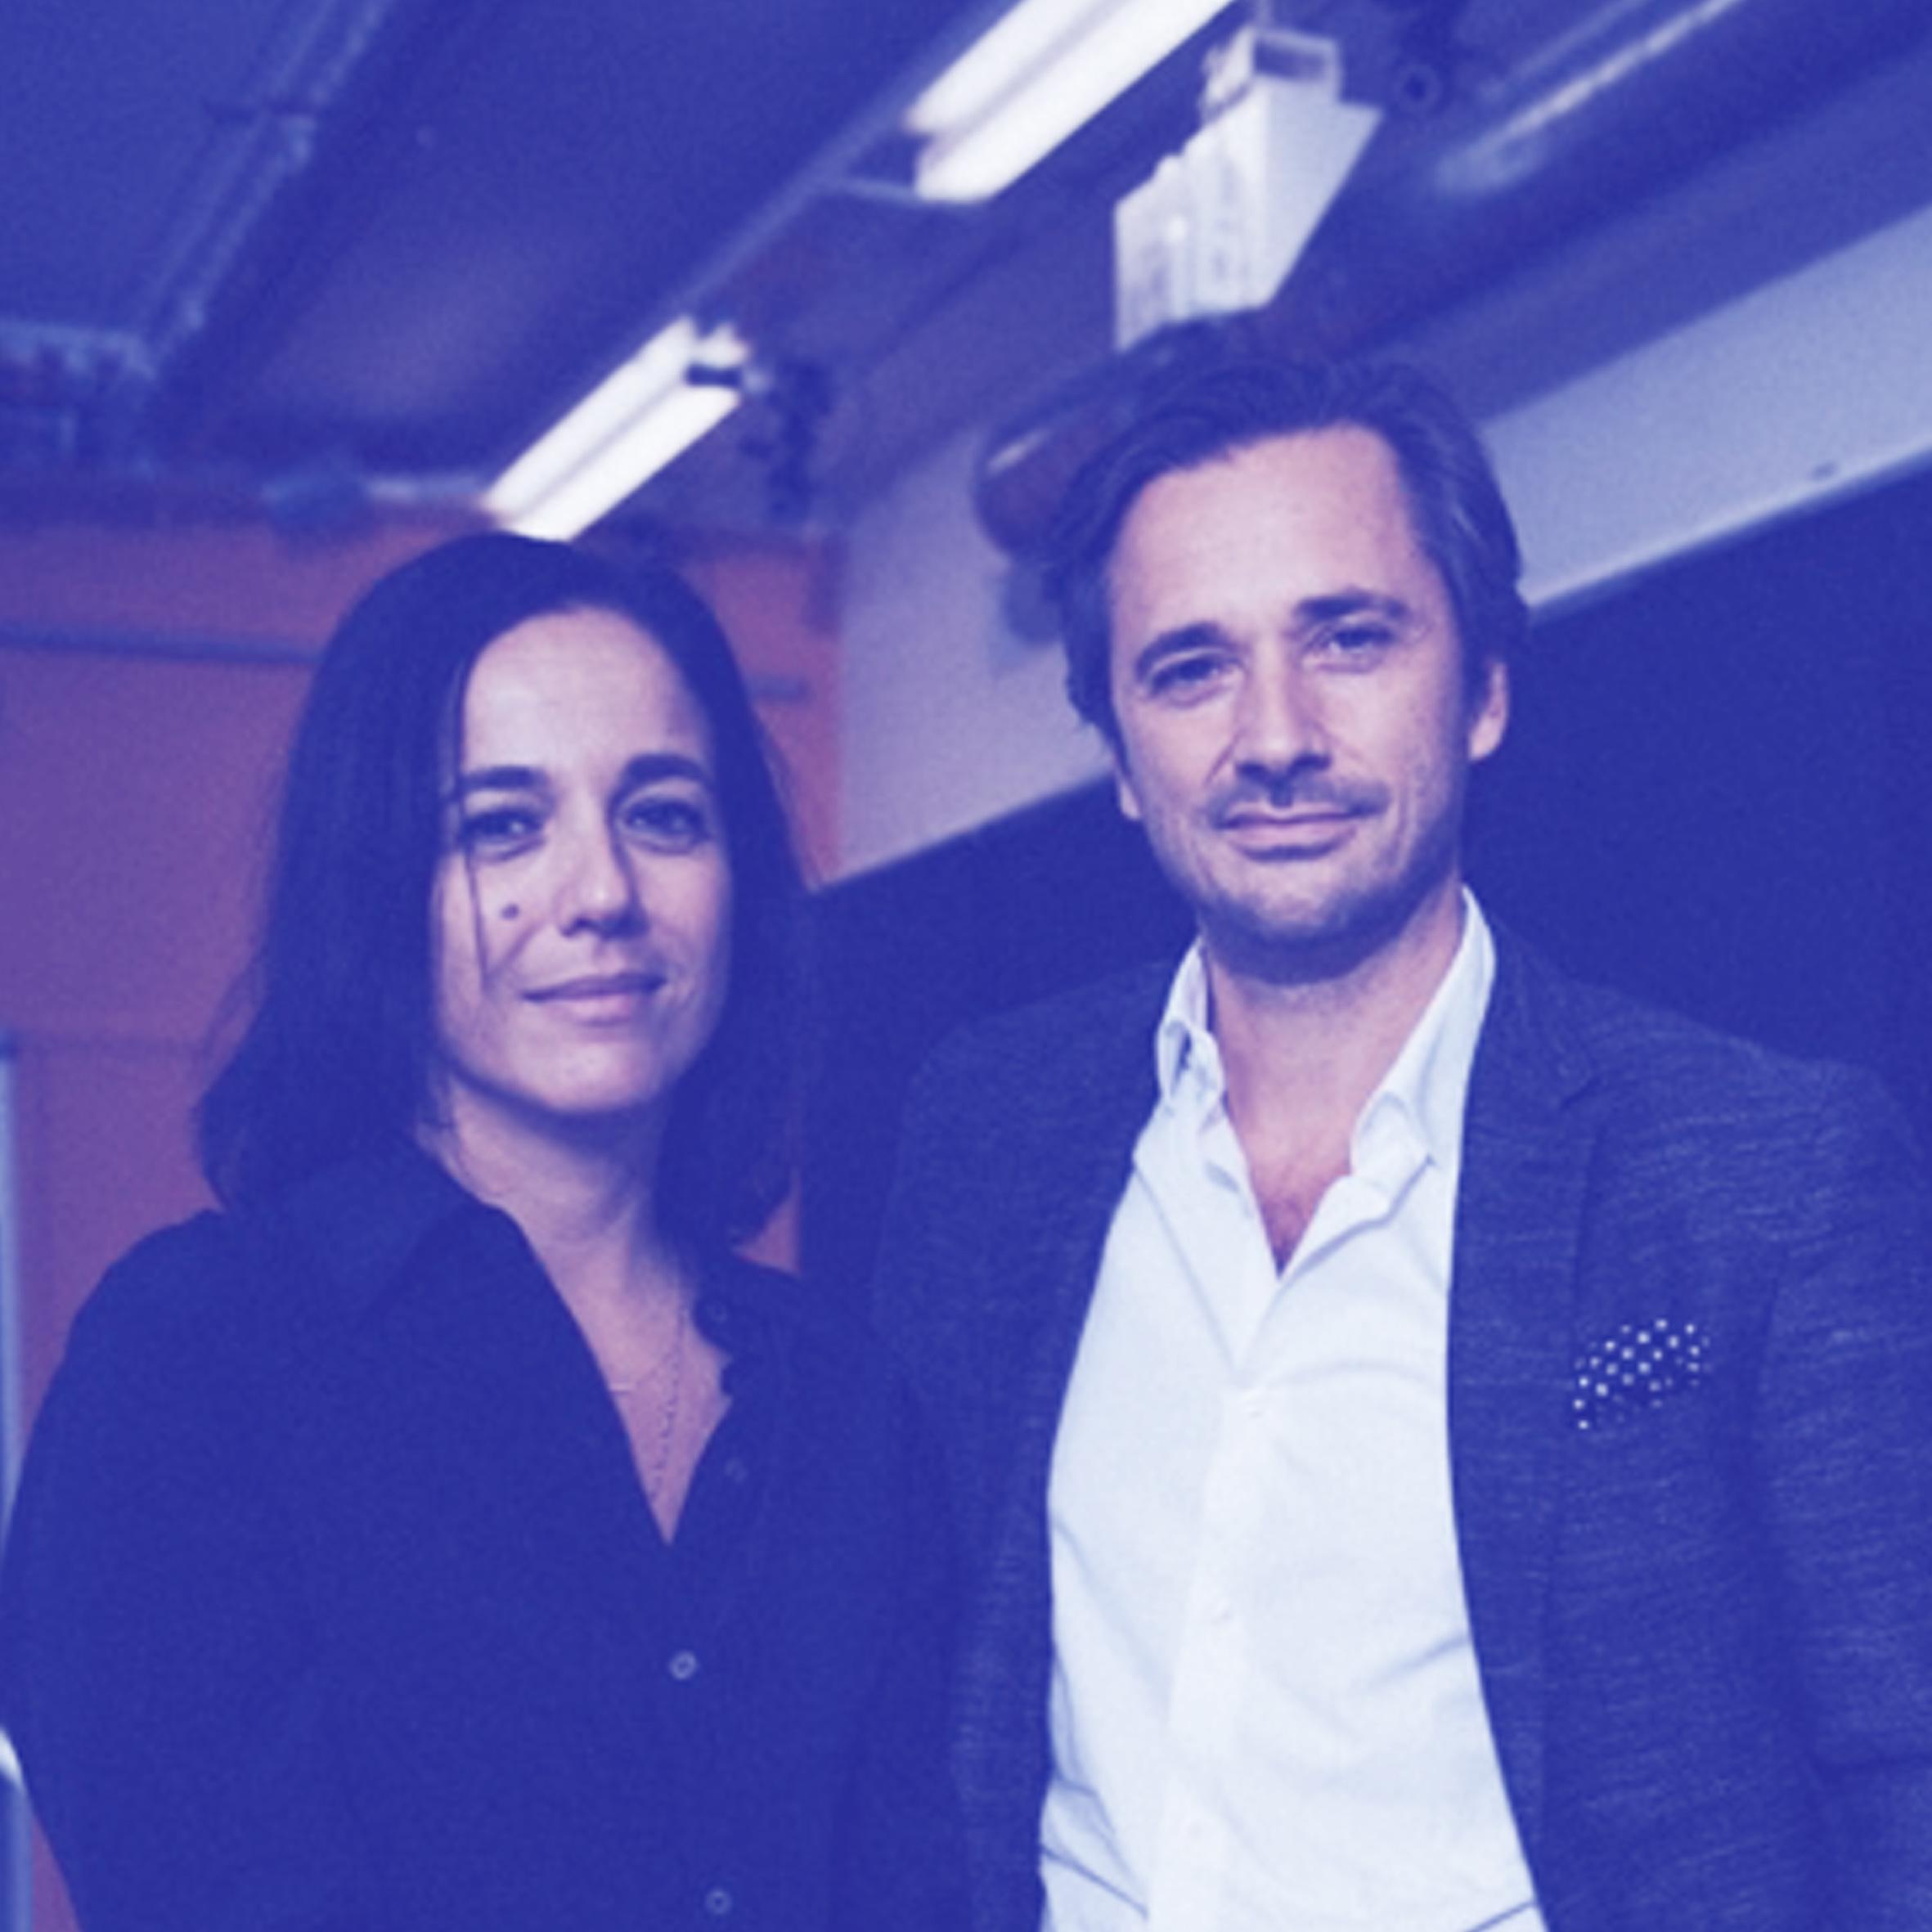 Jocelyne Block & Grégoire Courtine